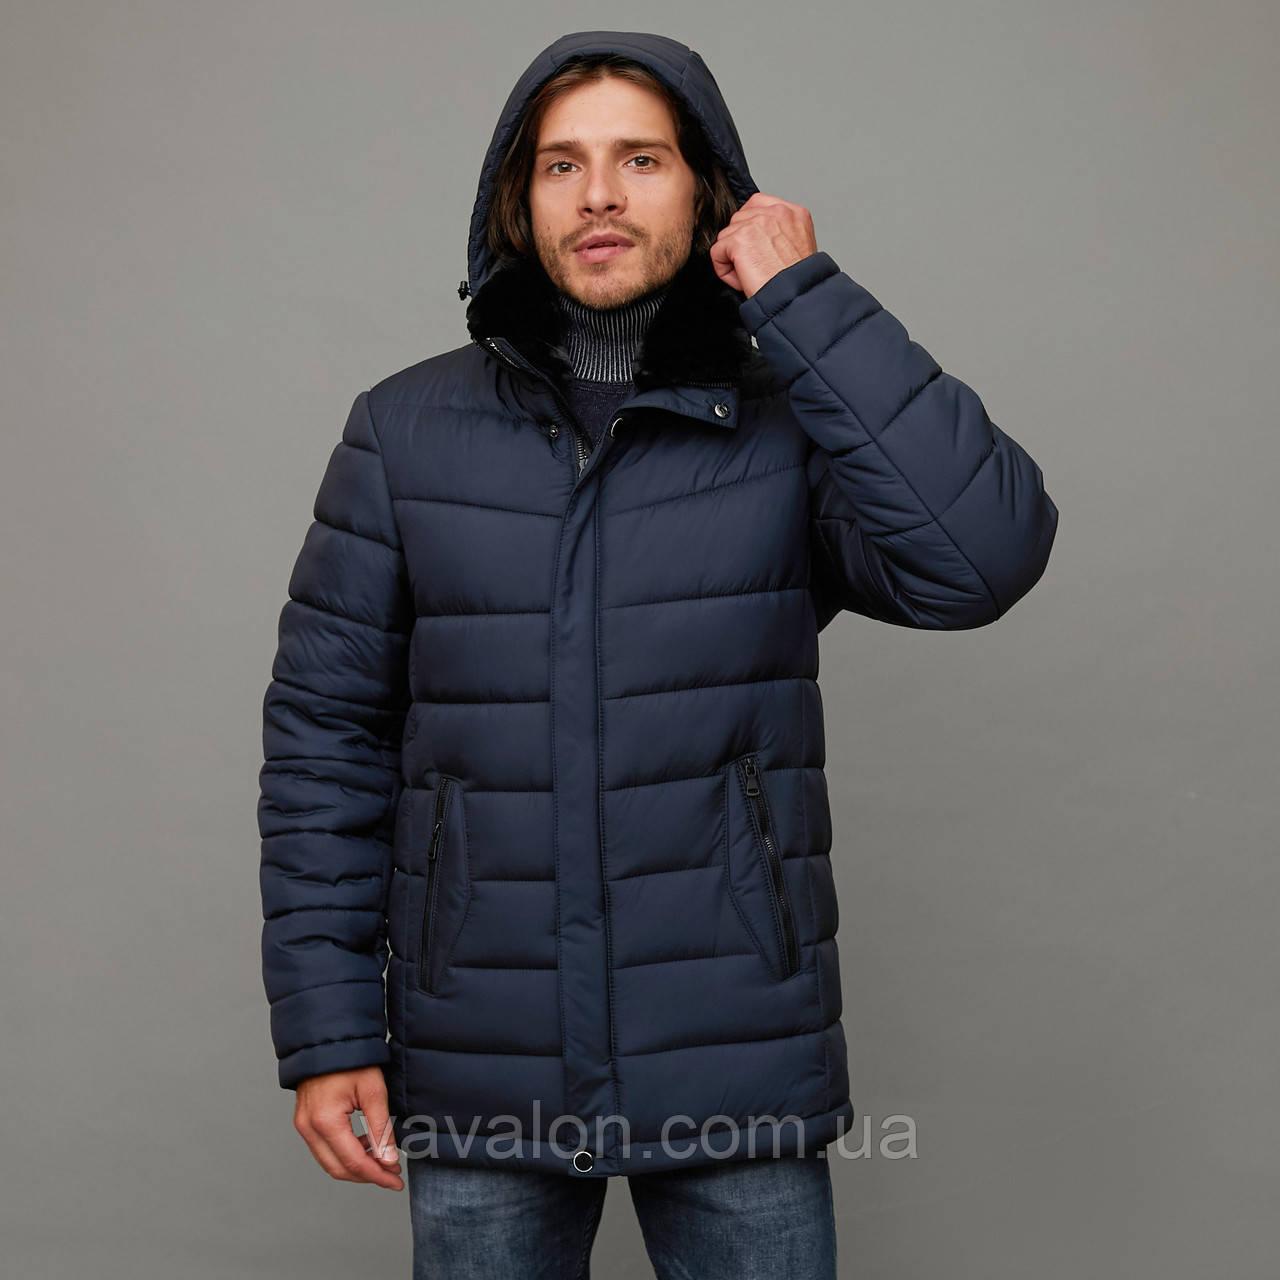 Зимняя мужская куртка Vavalon KZ-912 navy